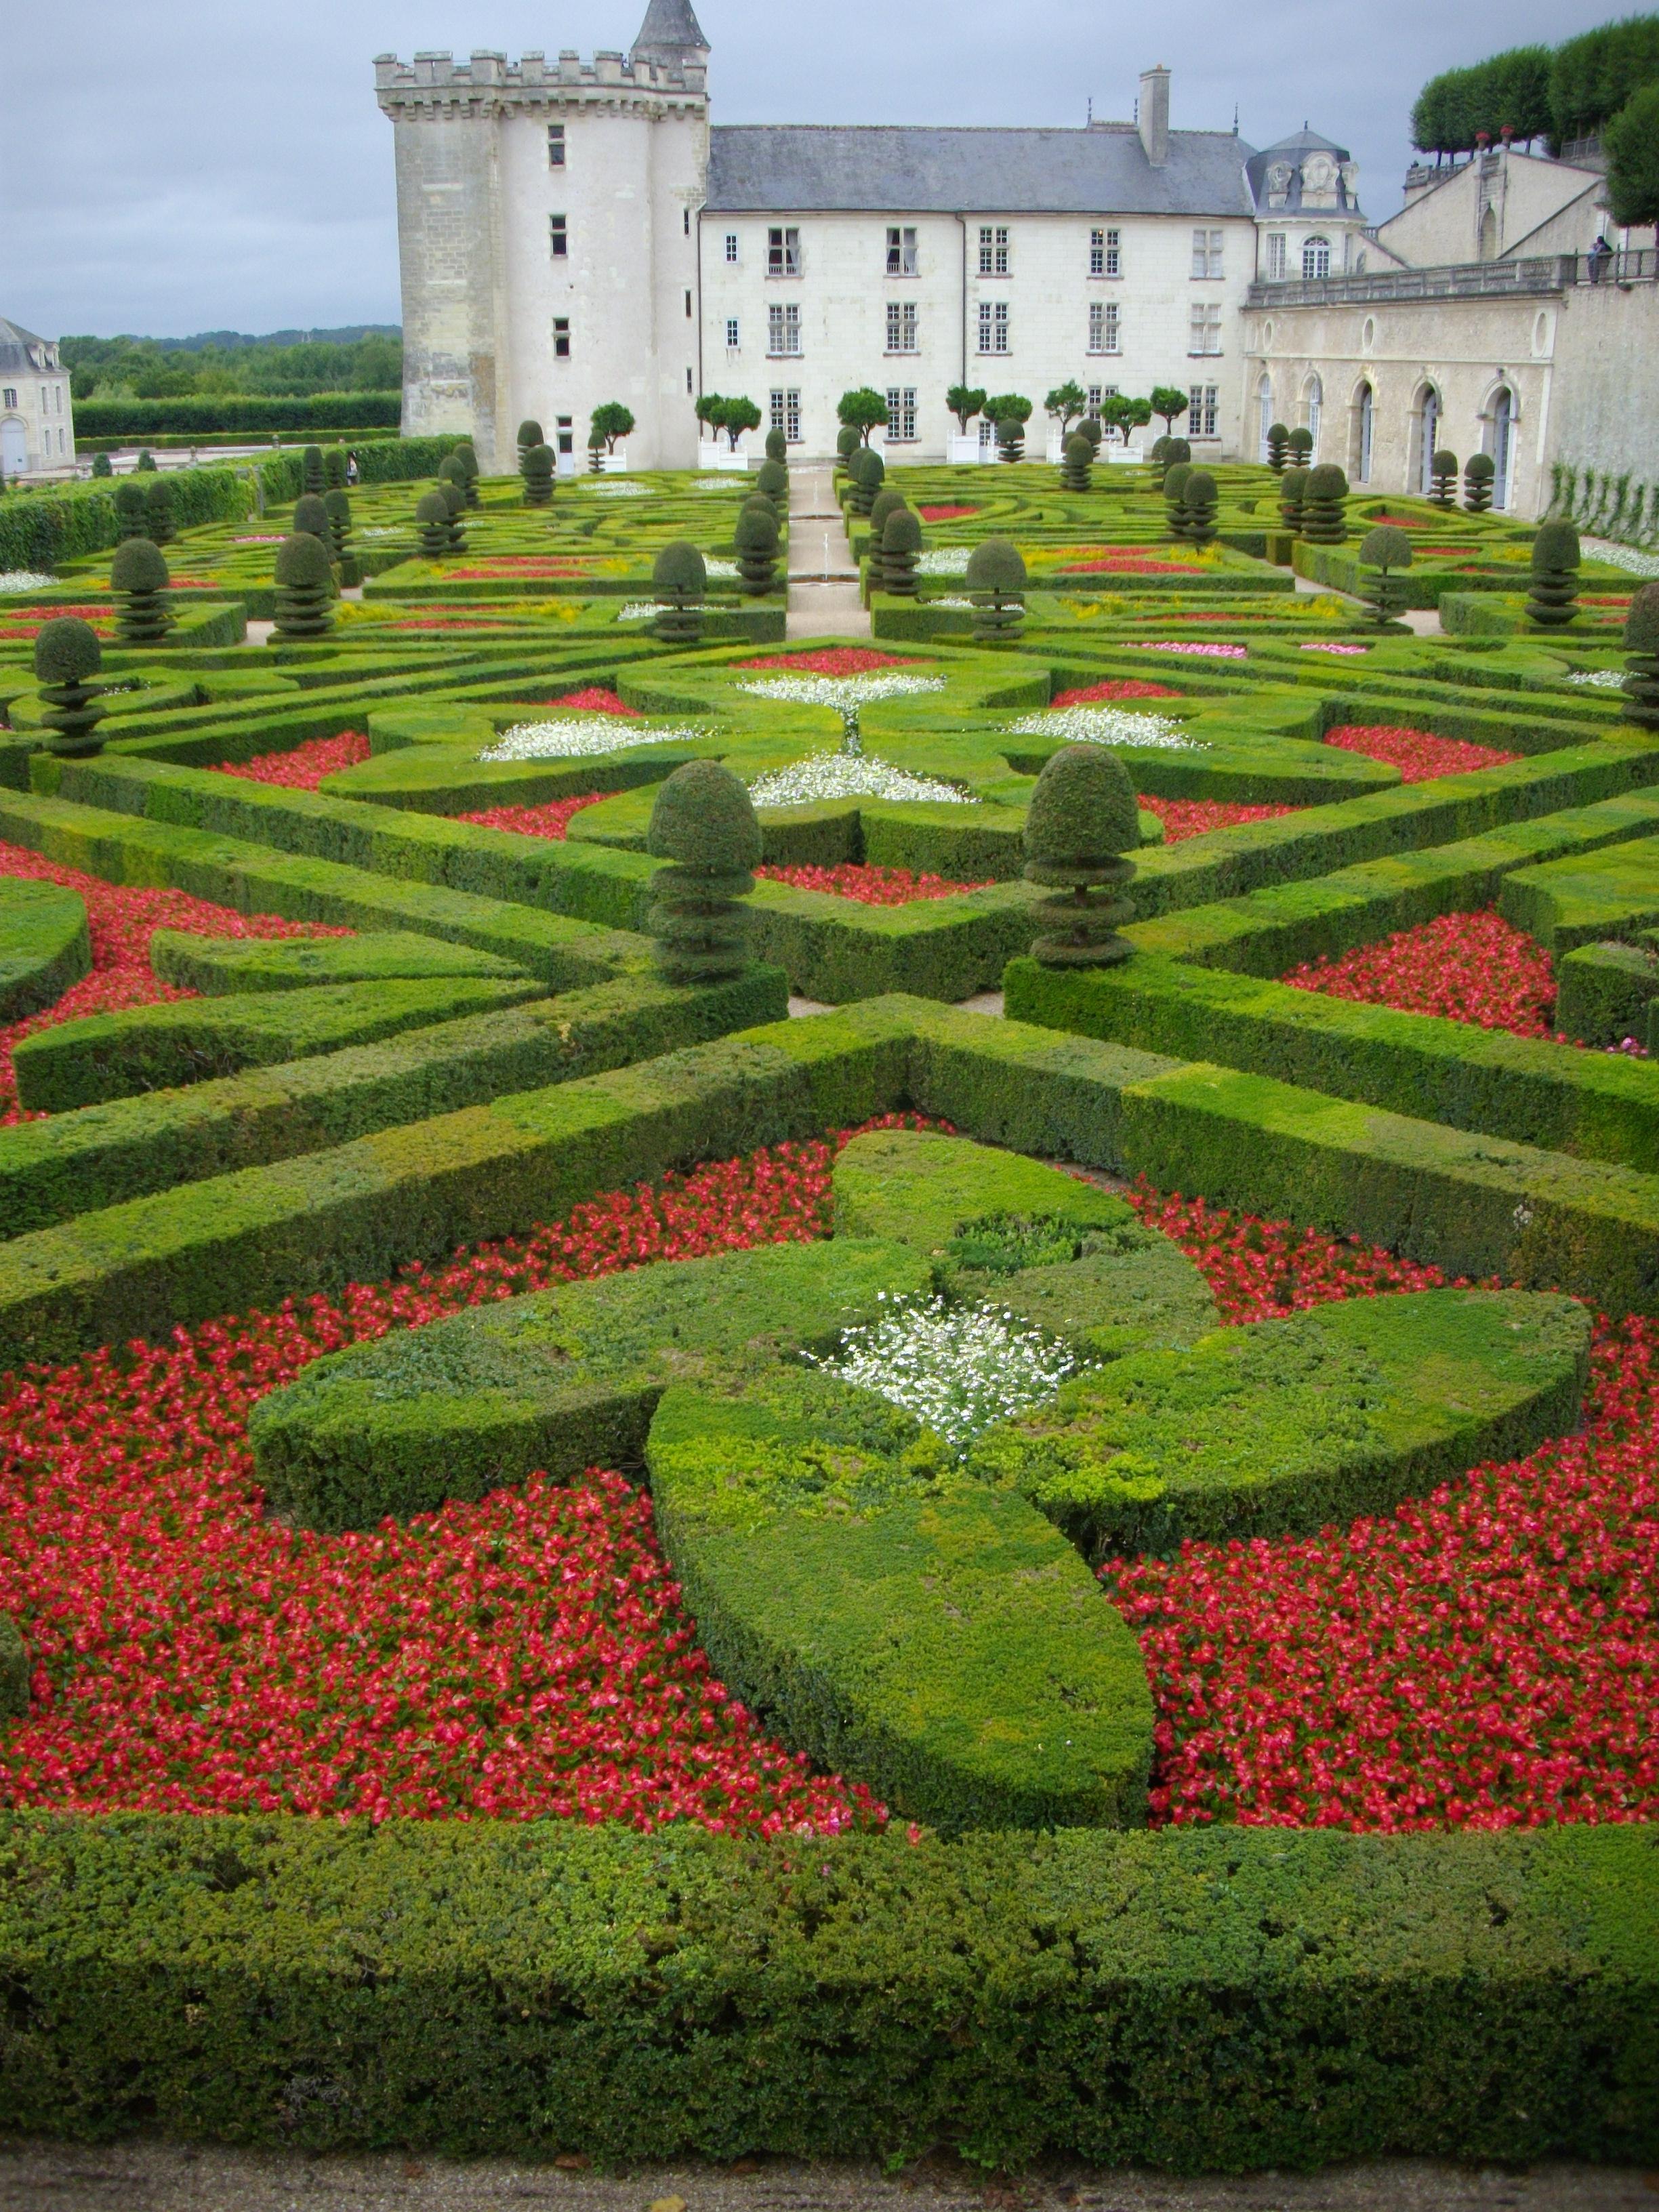 File:Villandry - château, jardin d\'ornement (12).jpg - Wikimedia Commons